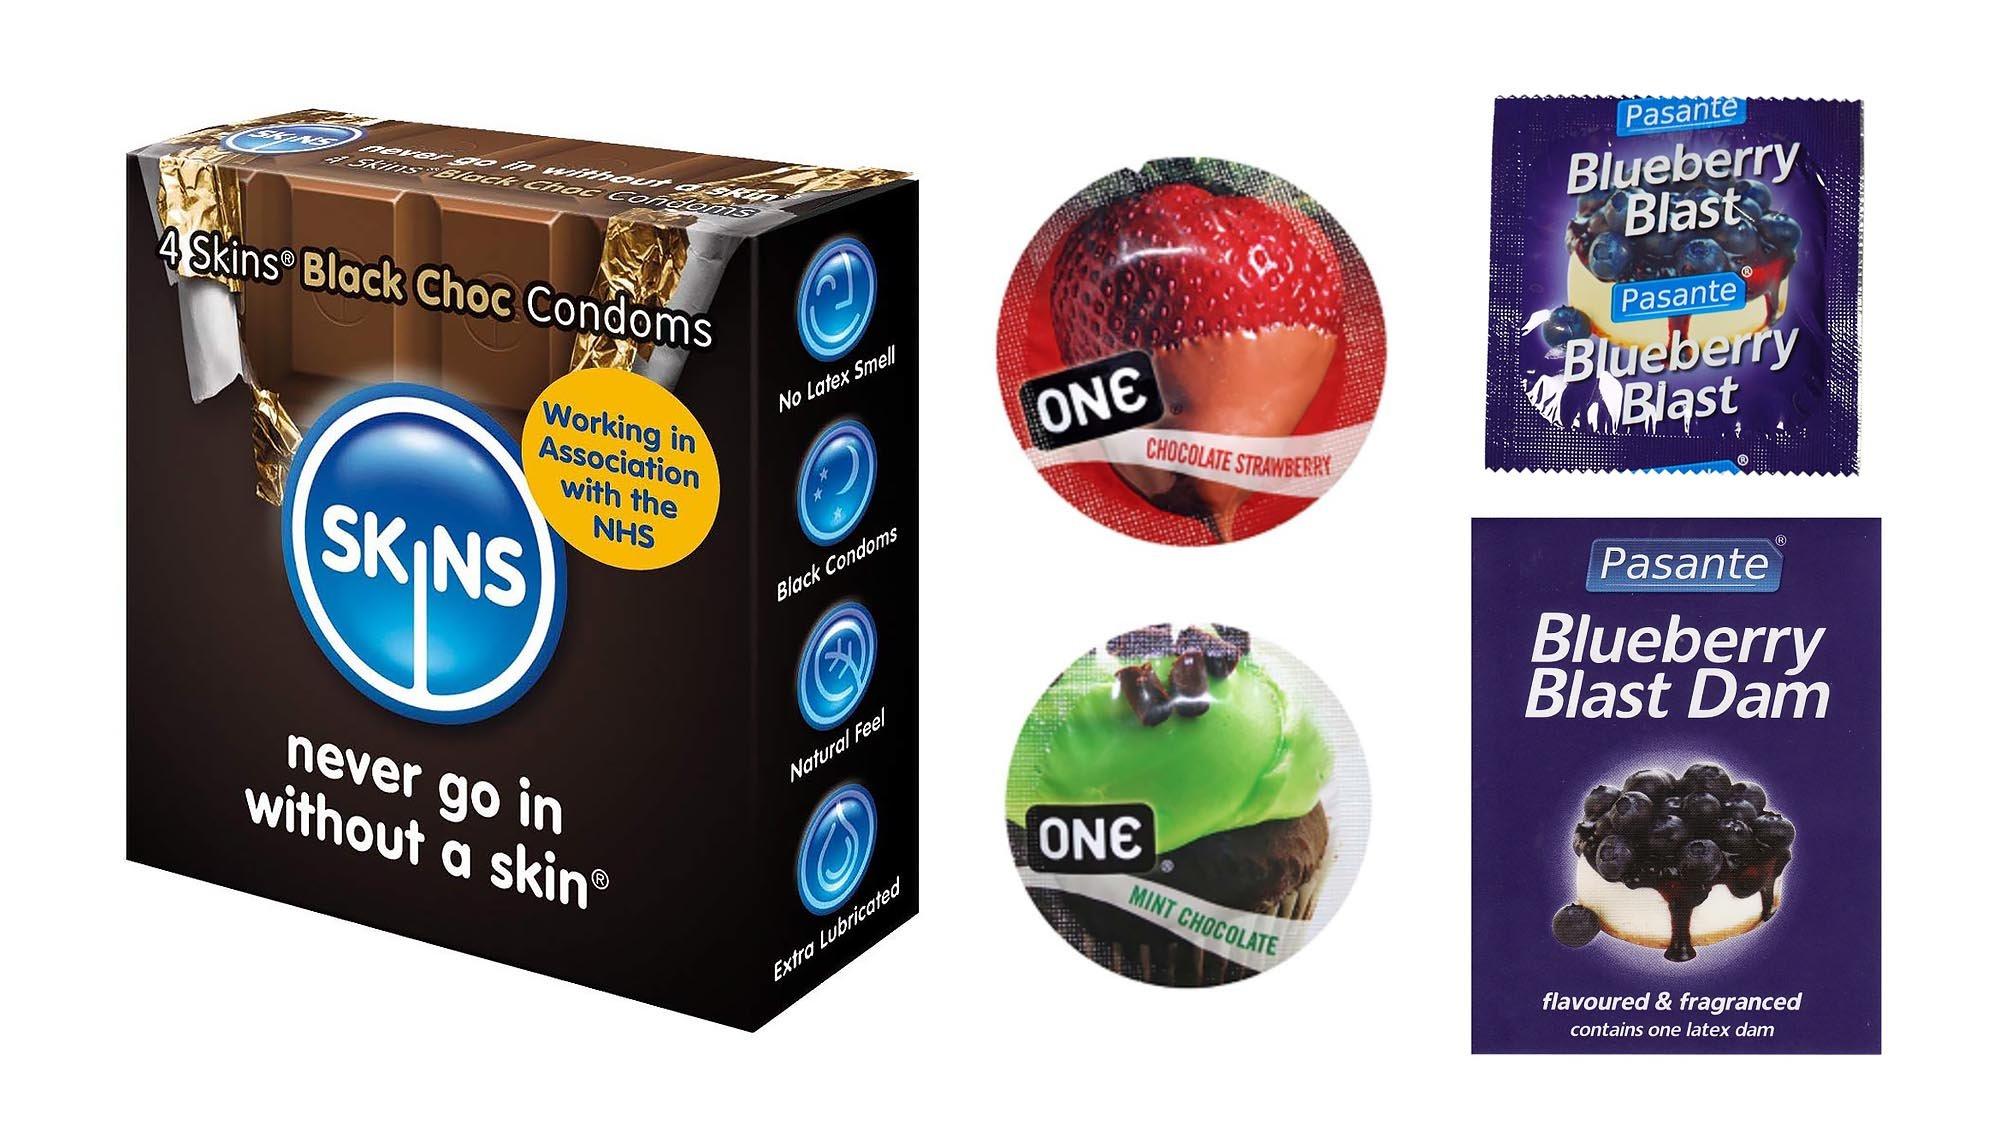 Skins Black Choc: Best chocolate flavoured condom